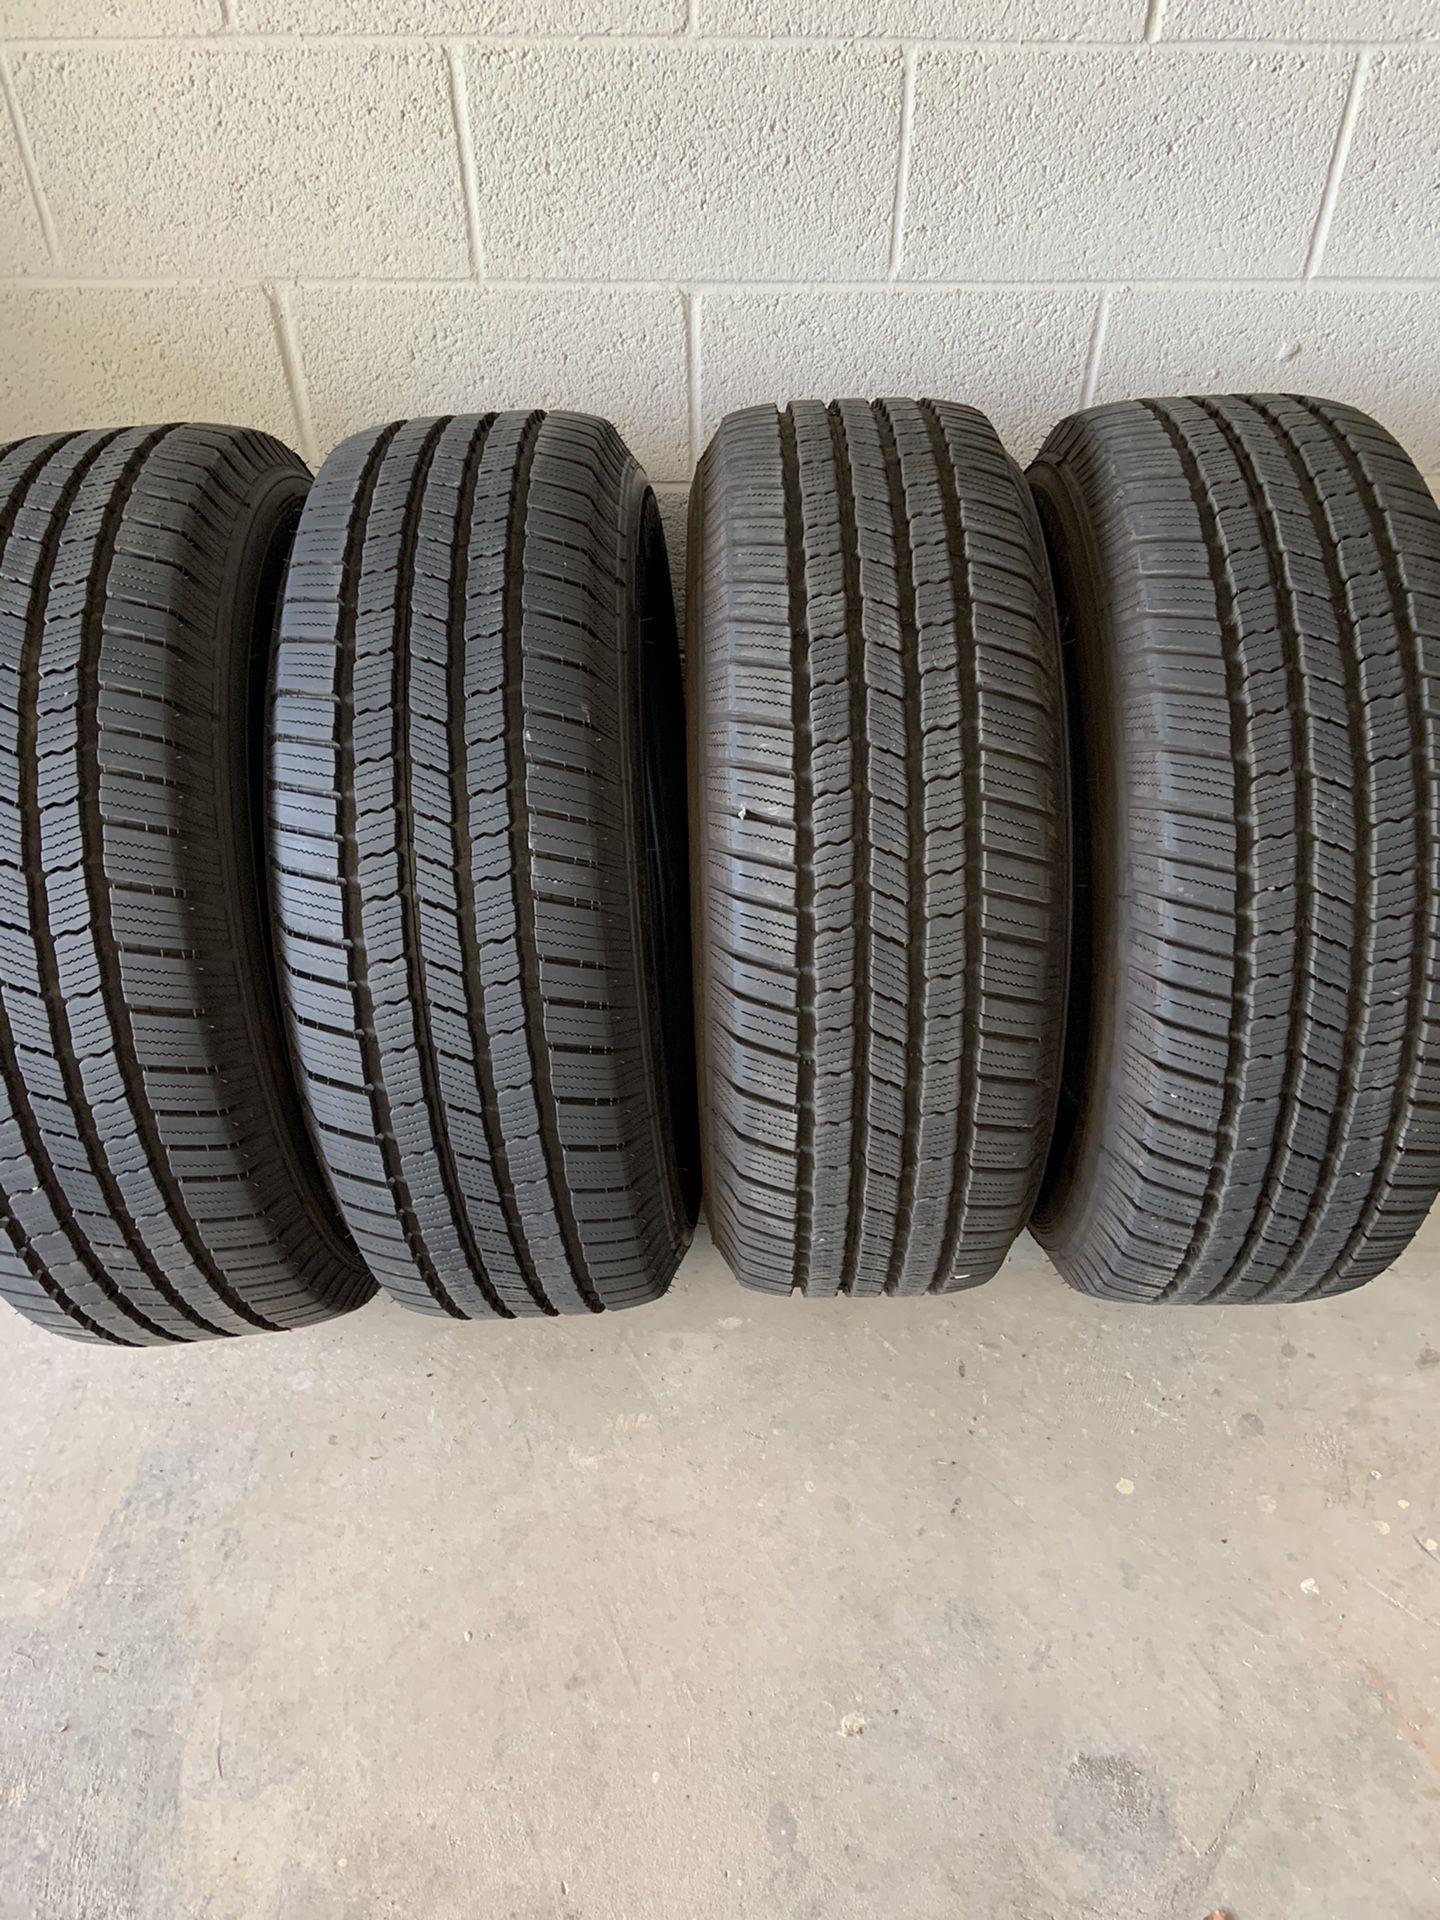 4 Michelin Defender LTX MS 265/65 R18